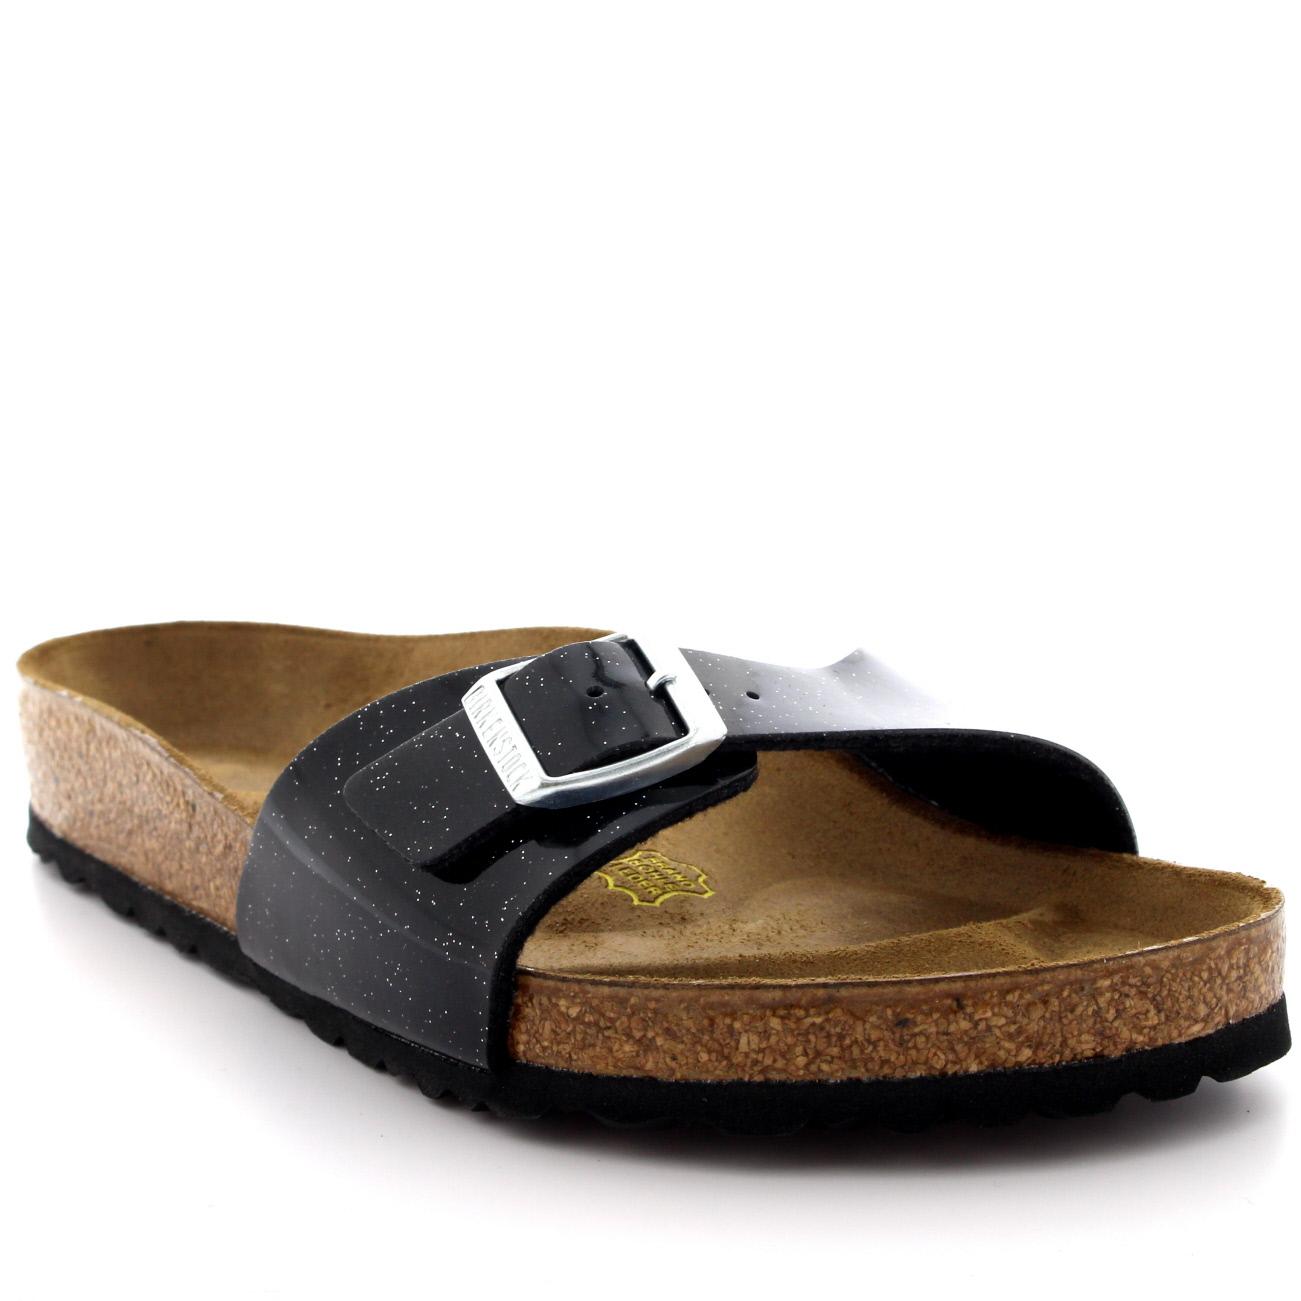 42c5e9e5b201 Betula Sandals By Birkenstock 4 Foot Bed | Portal for Tenders